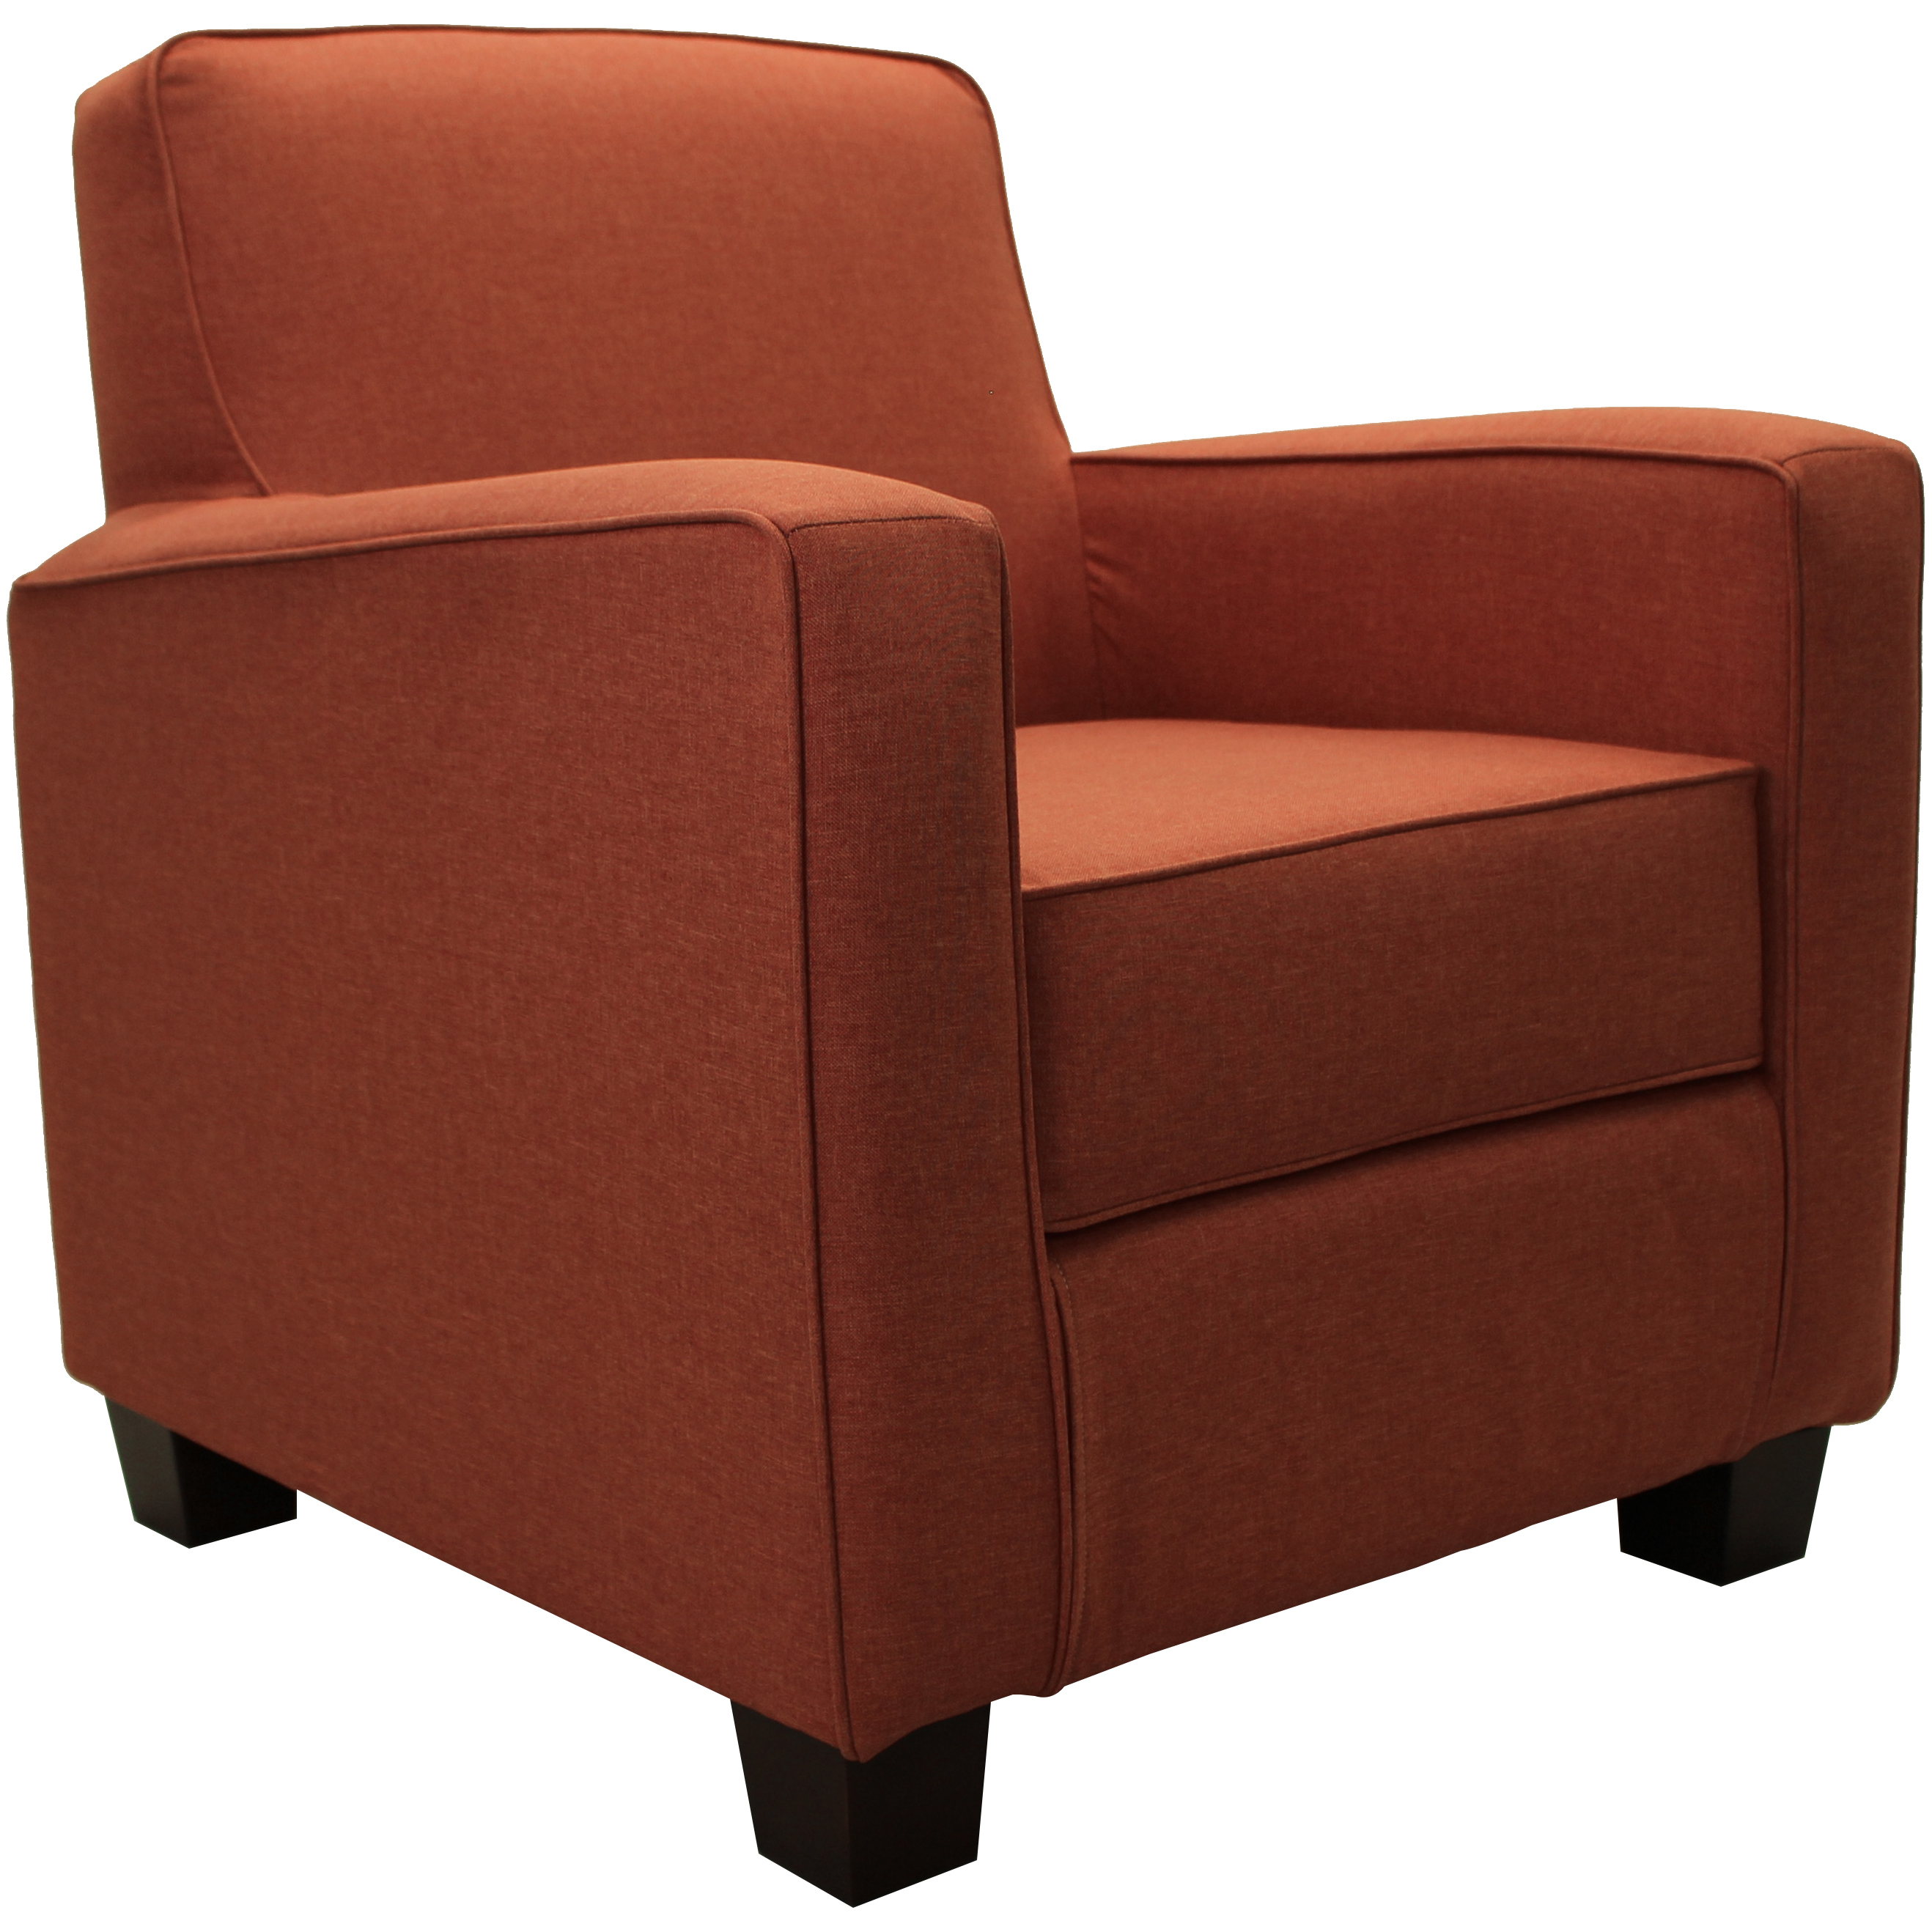 Fox Hill Johnston Trackarm Lounge Chair, Multiple Colors